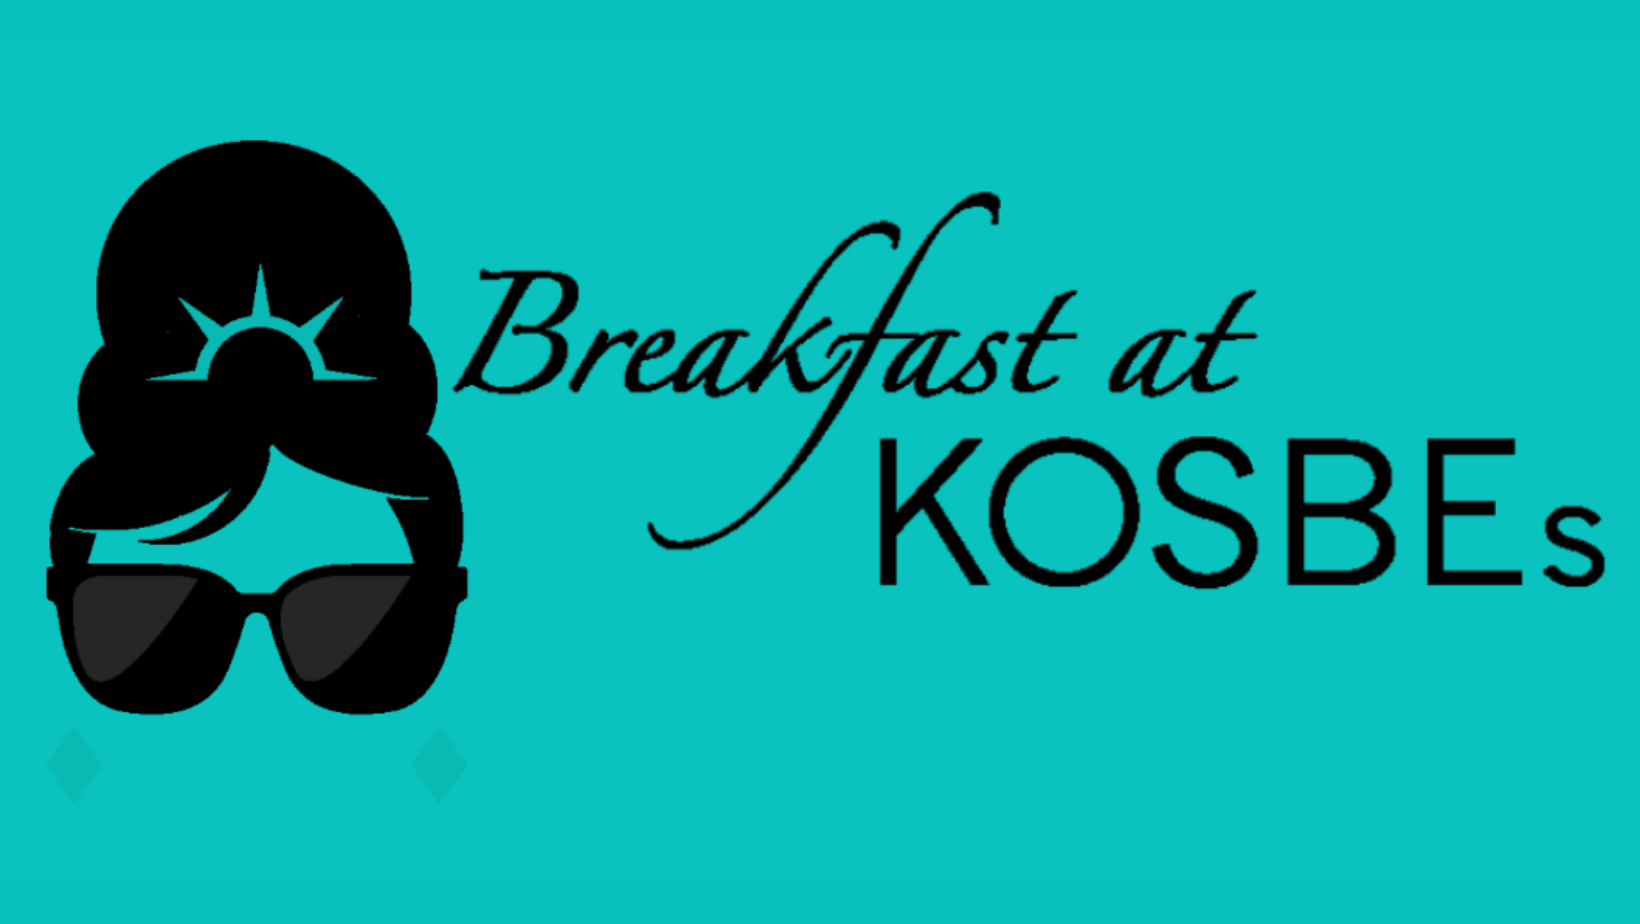 Breakfast-at-KOSBEs-Updated.png